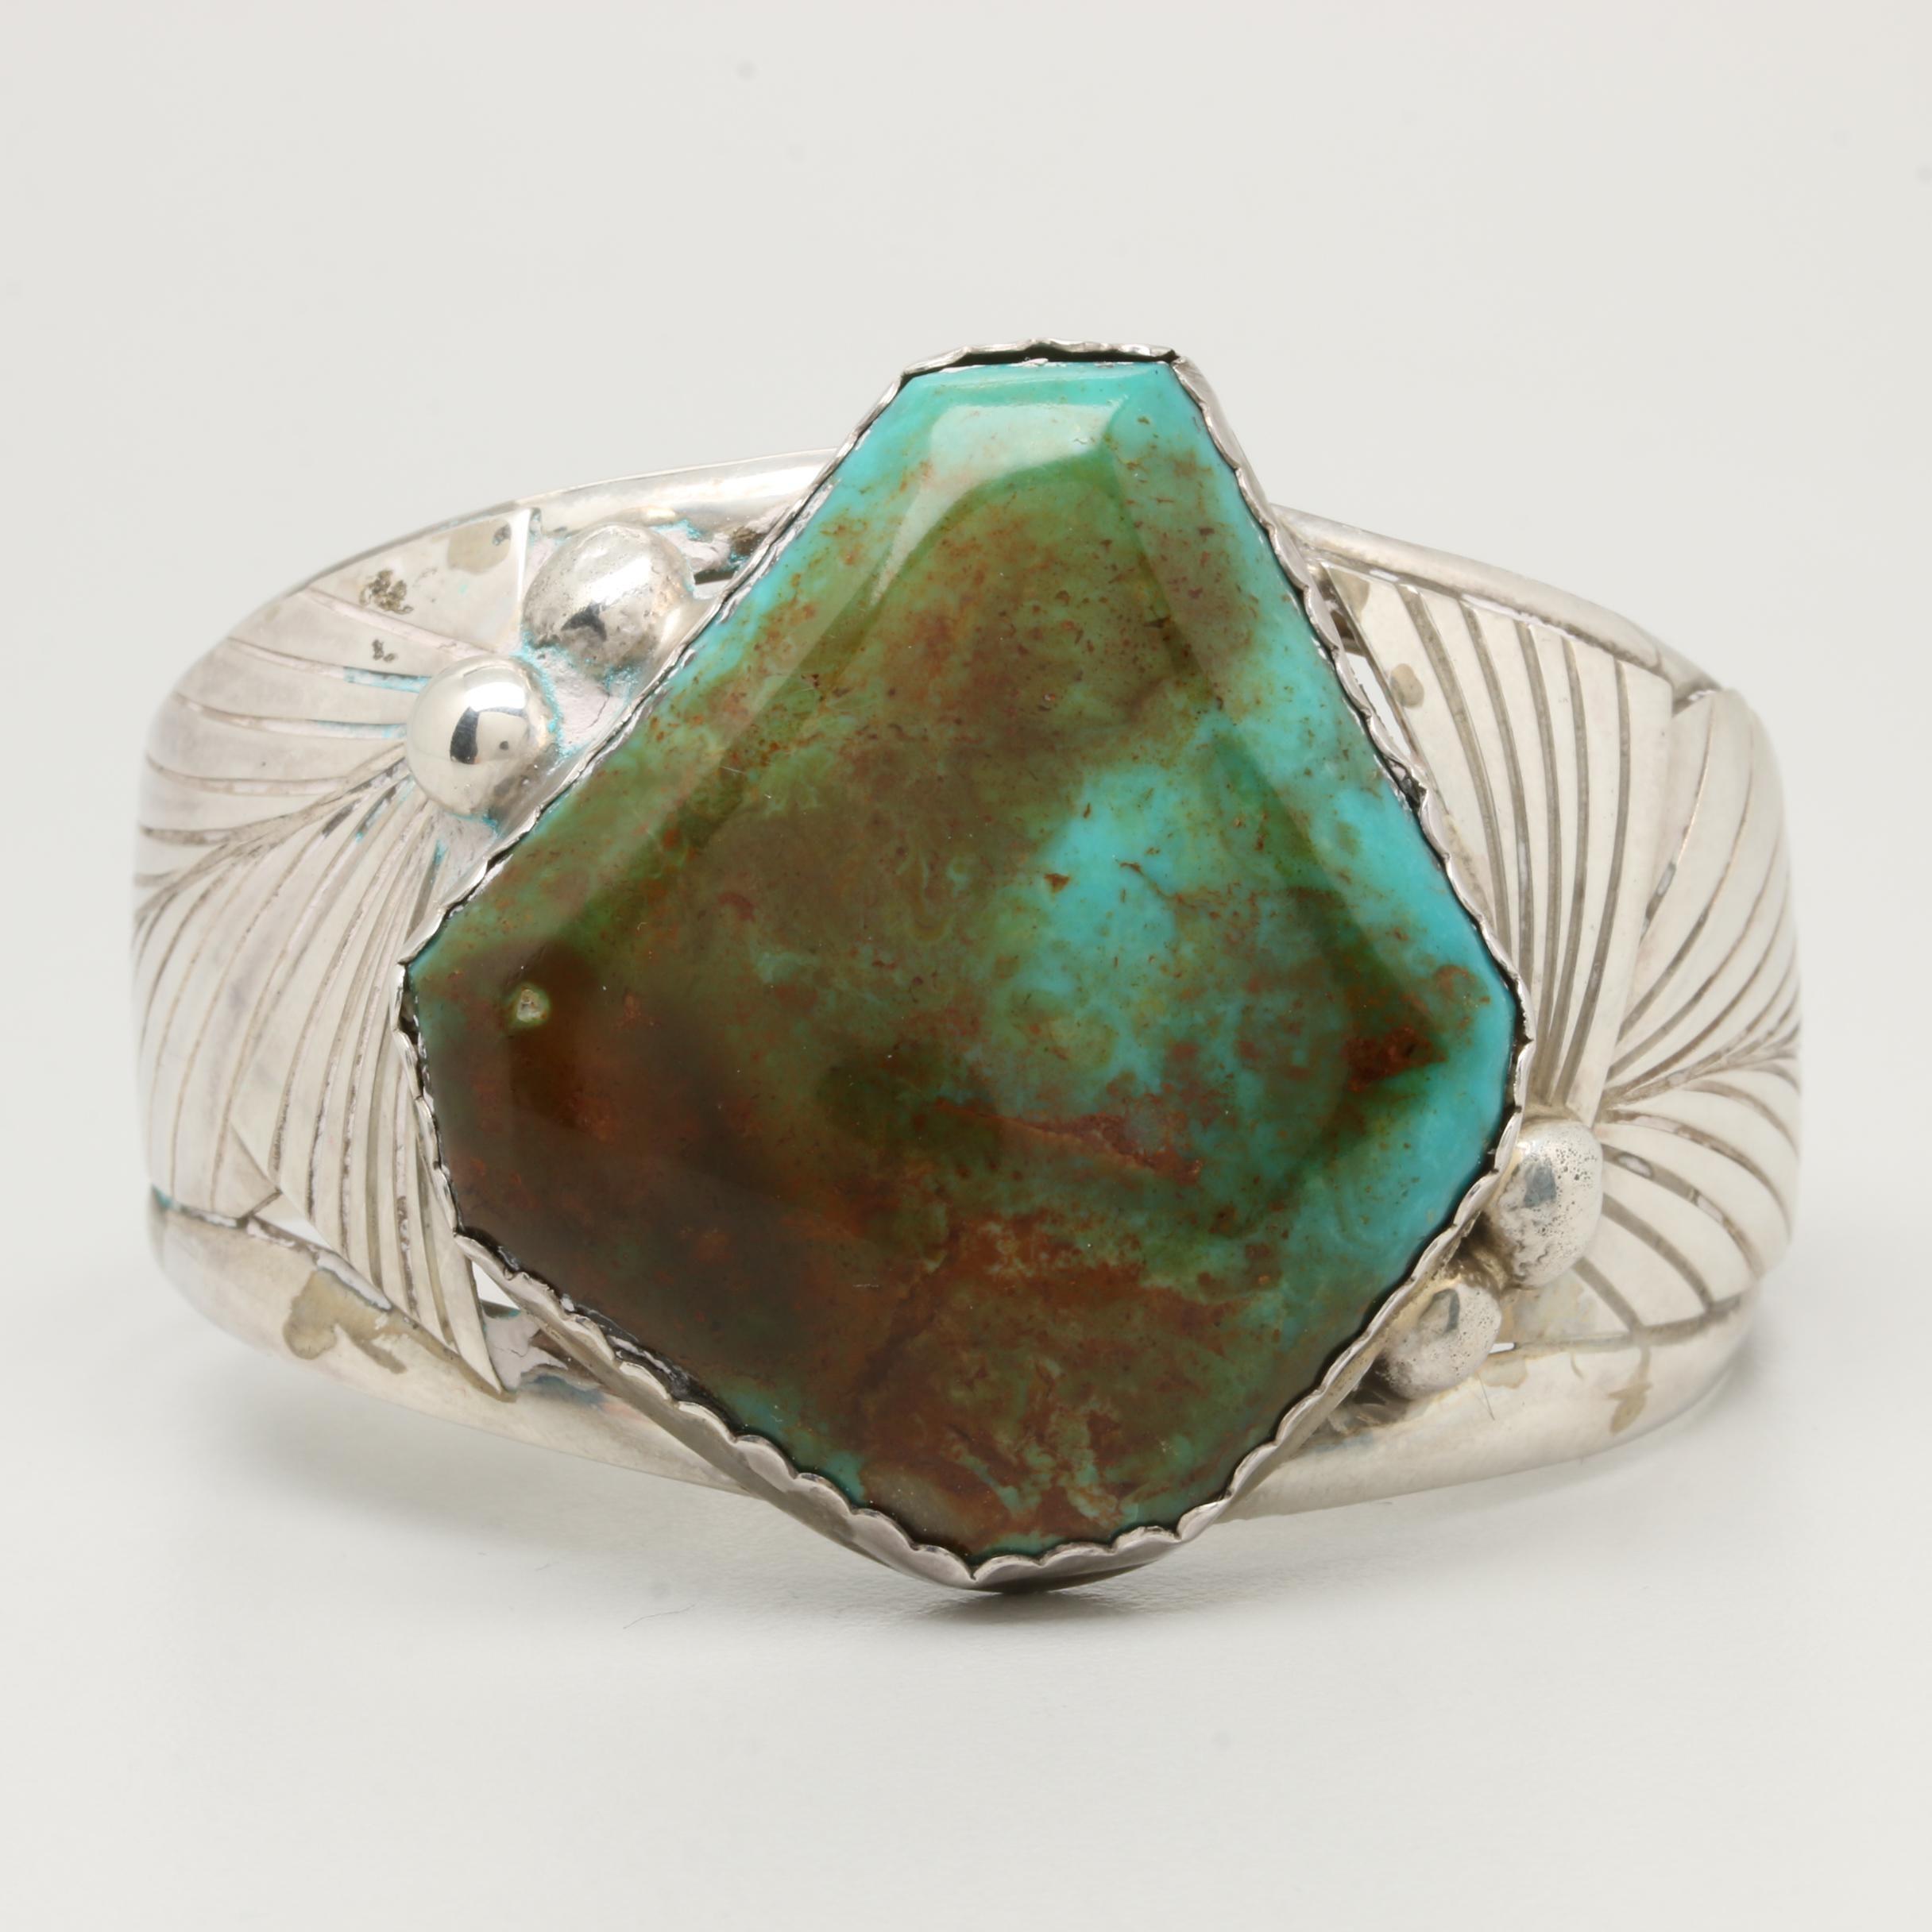 Roy Buck Navajo Diné Sterling Silver Turquoise Cuff Bracelet